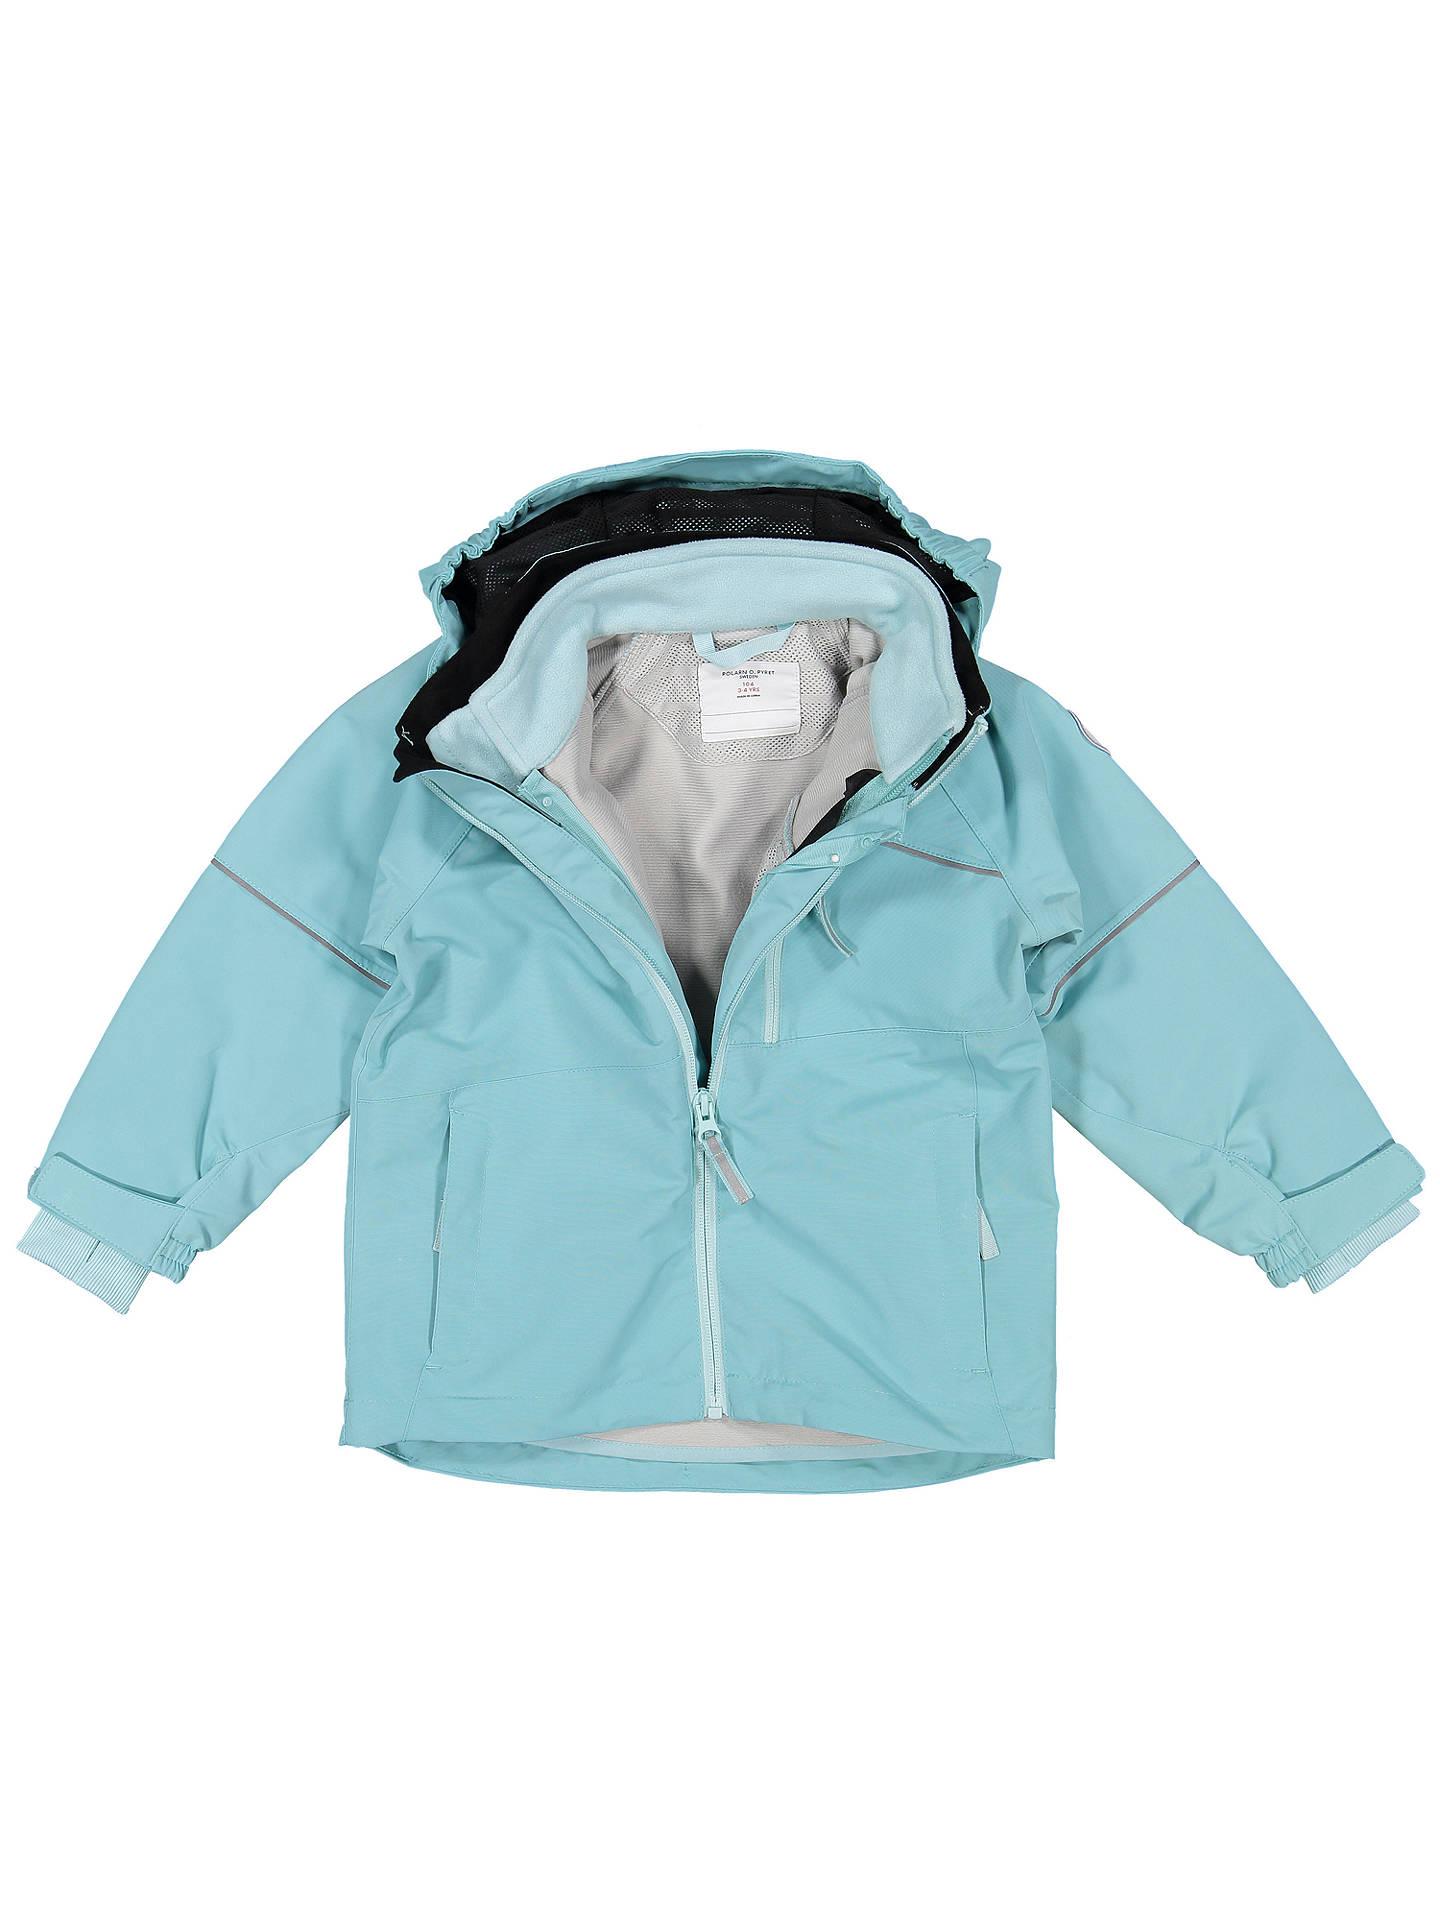 5c750acd2 Polarn O. Pyret Children s Shell Coat at John Lewis   Partners